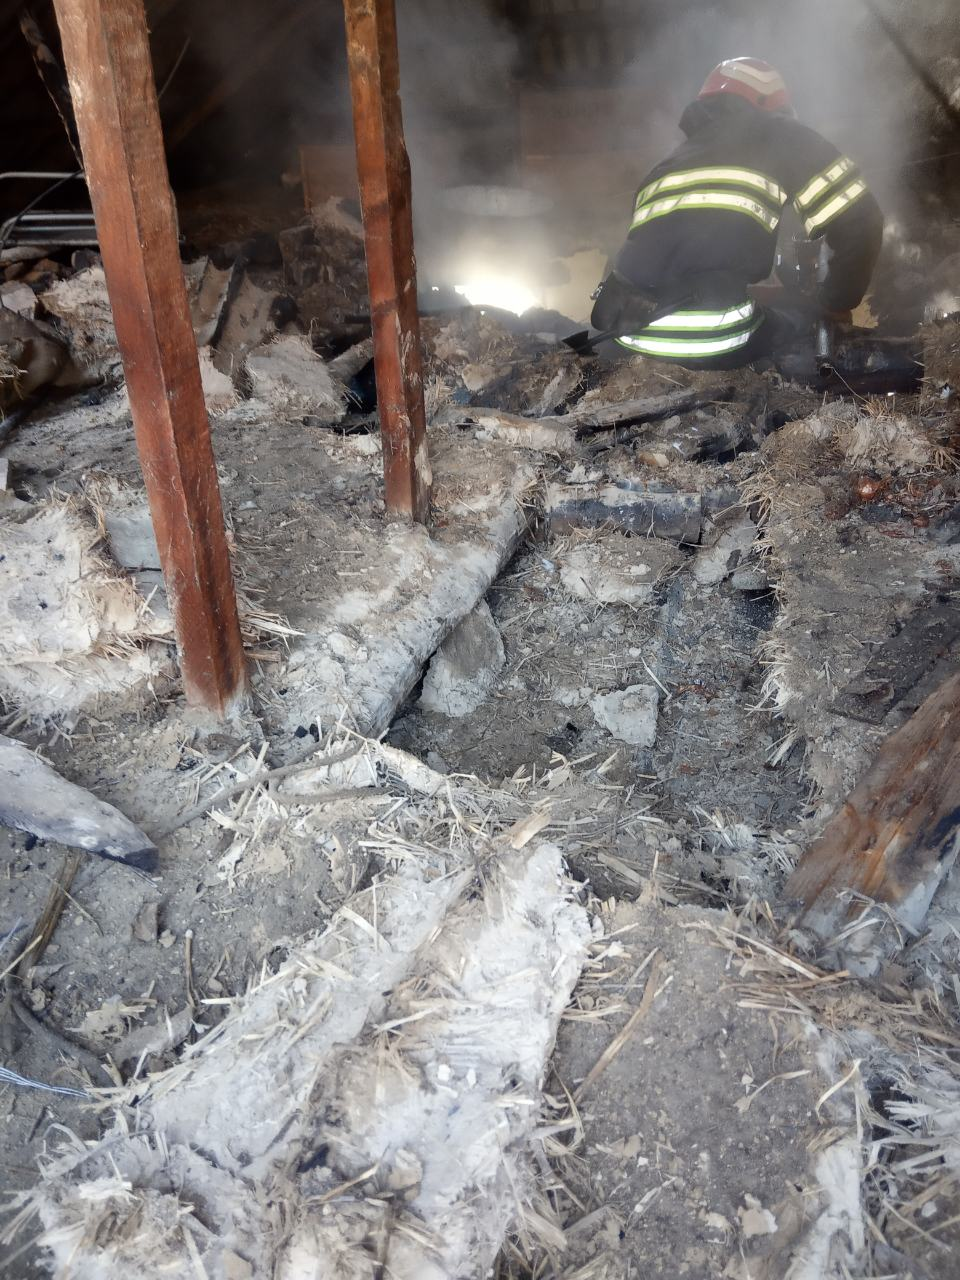 В Богуславі врятовано власницю будинку, в якому сталася пожежа -  - IMG 7a5be357982c615f8594ea923c63cd39 V